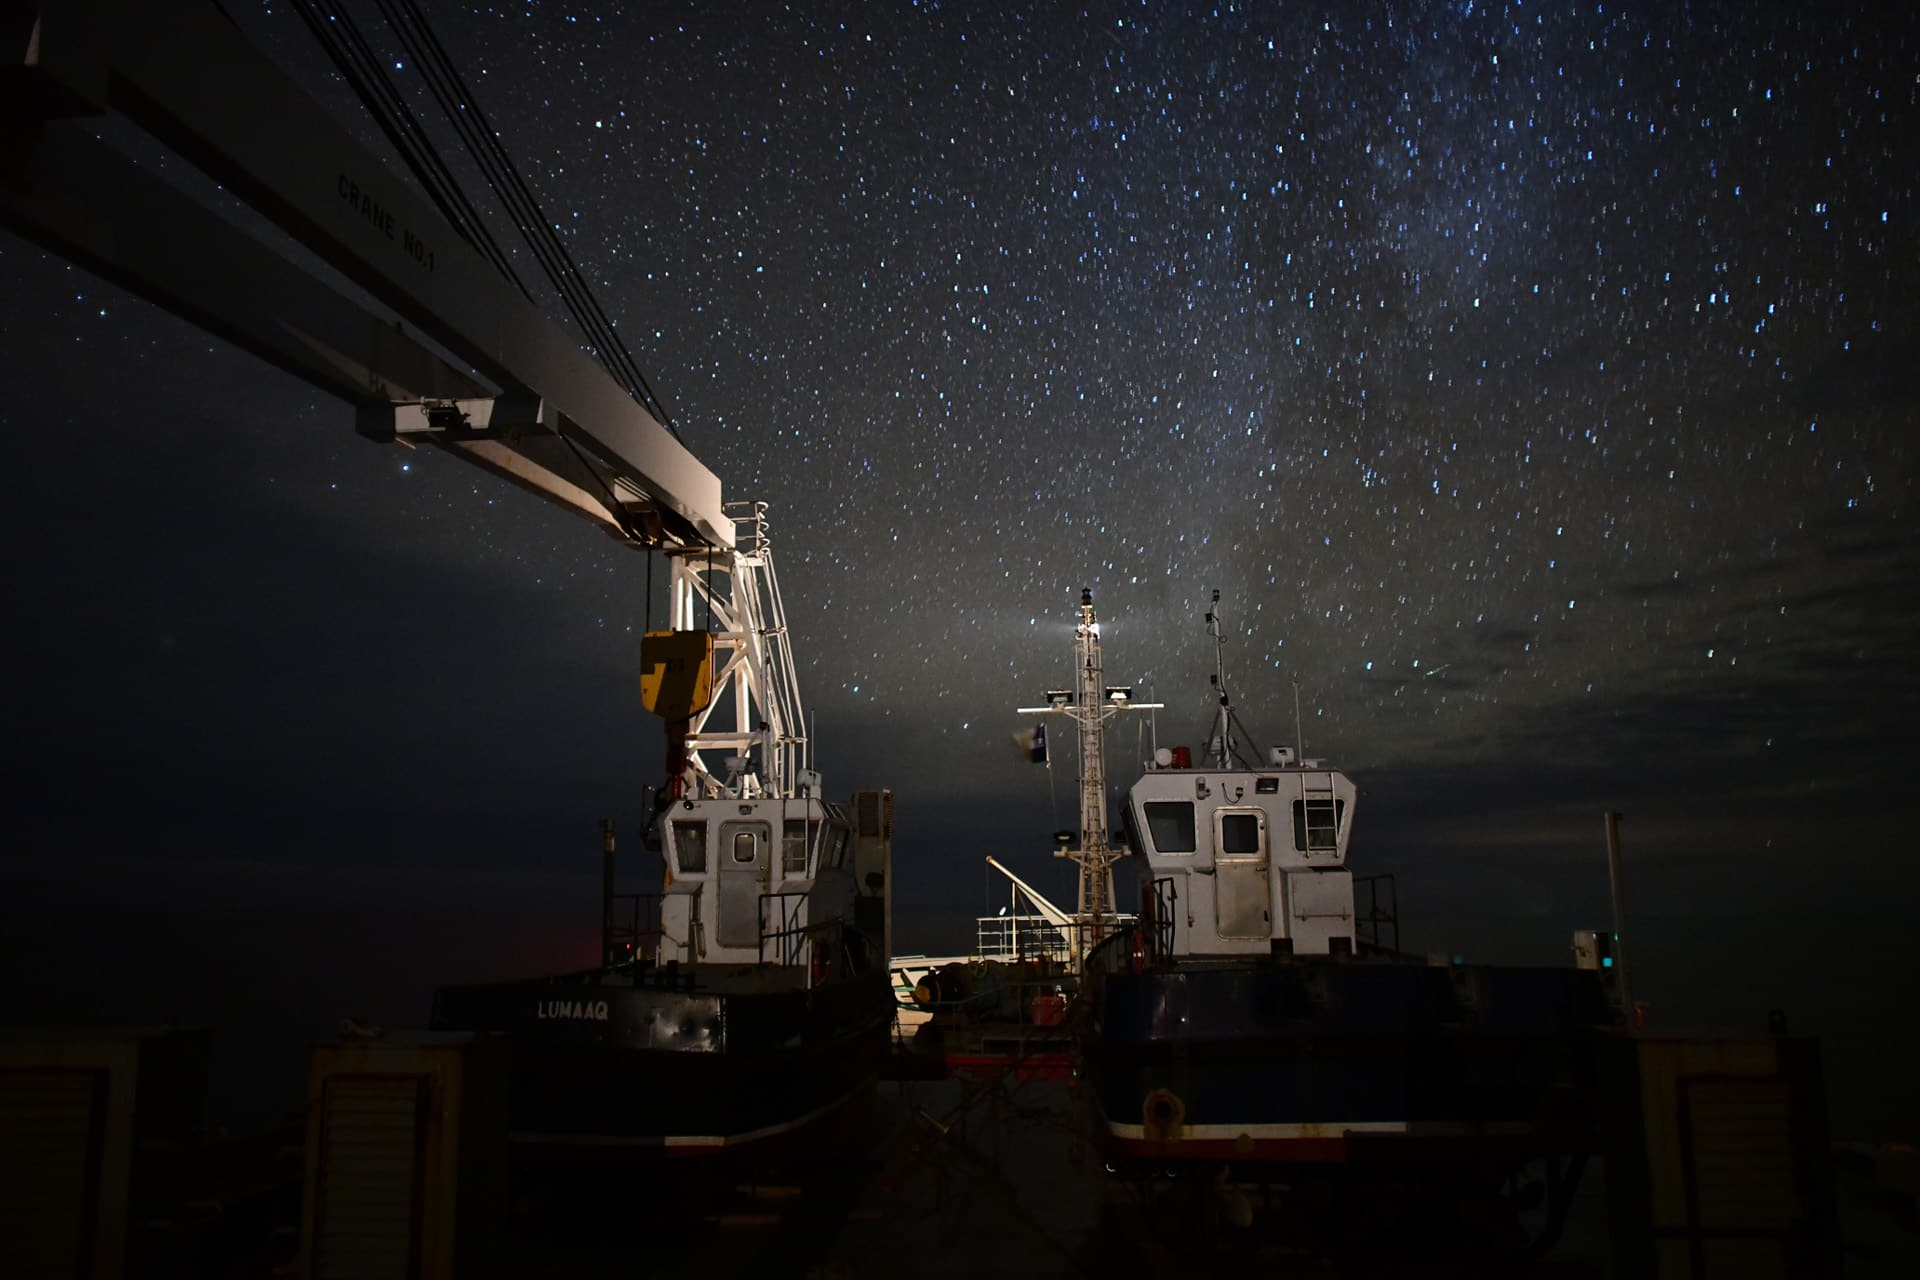 Night sky over the Northwest Passage